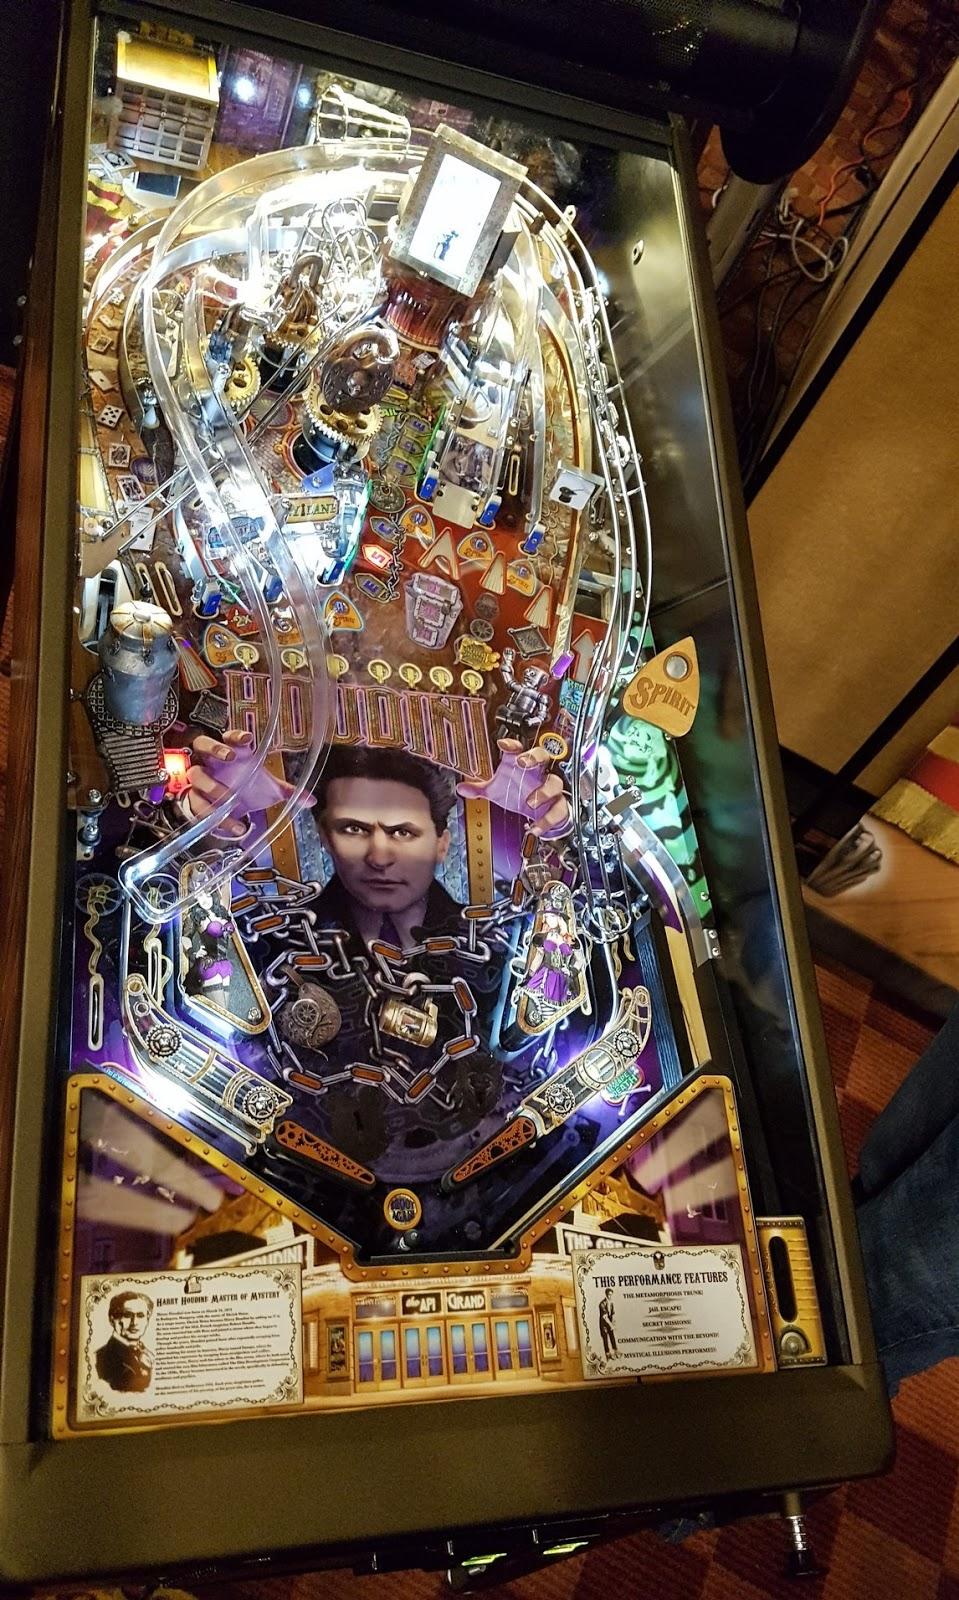 The Pinball Arcade |OT| play them all from Soho to Brighton | NeoGAF